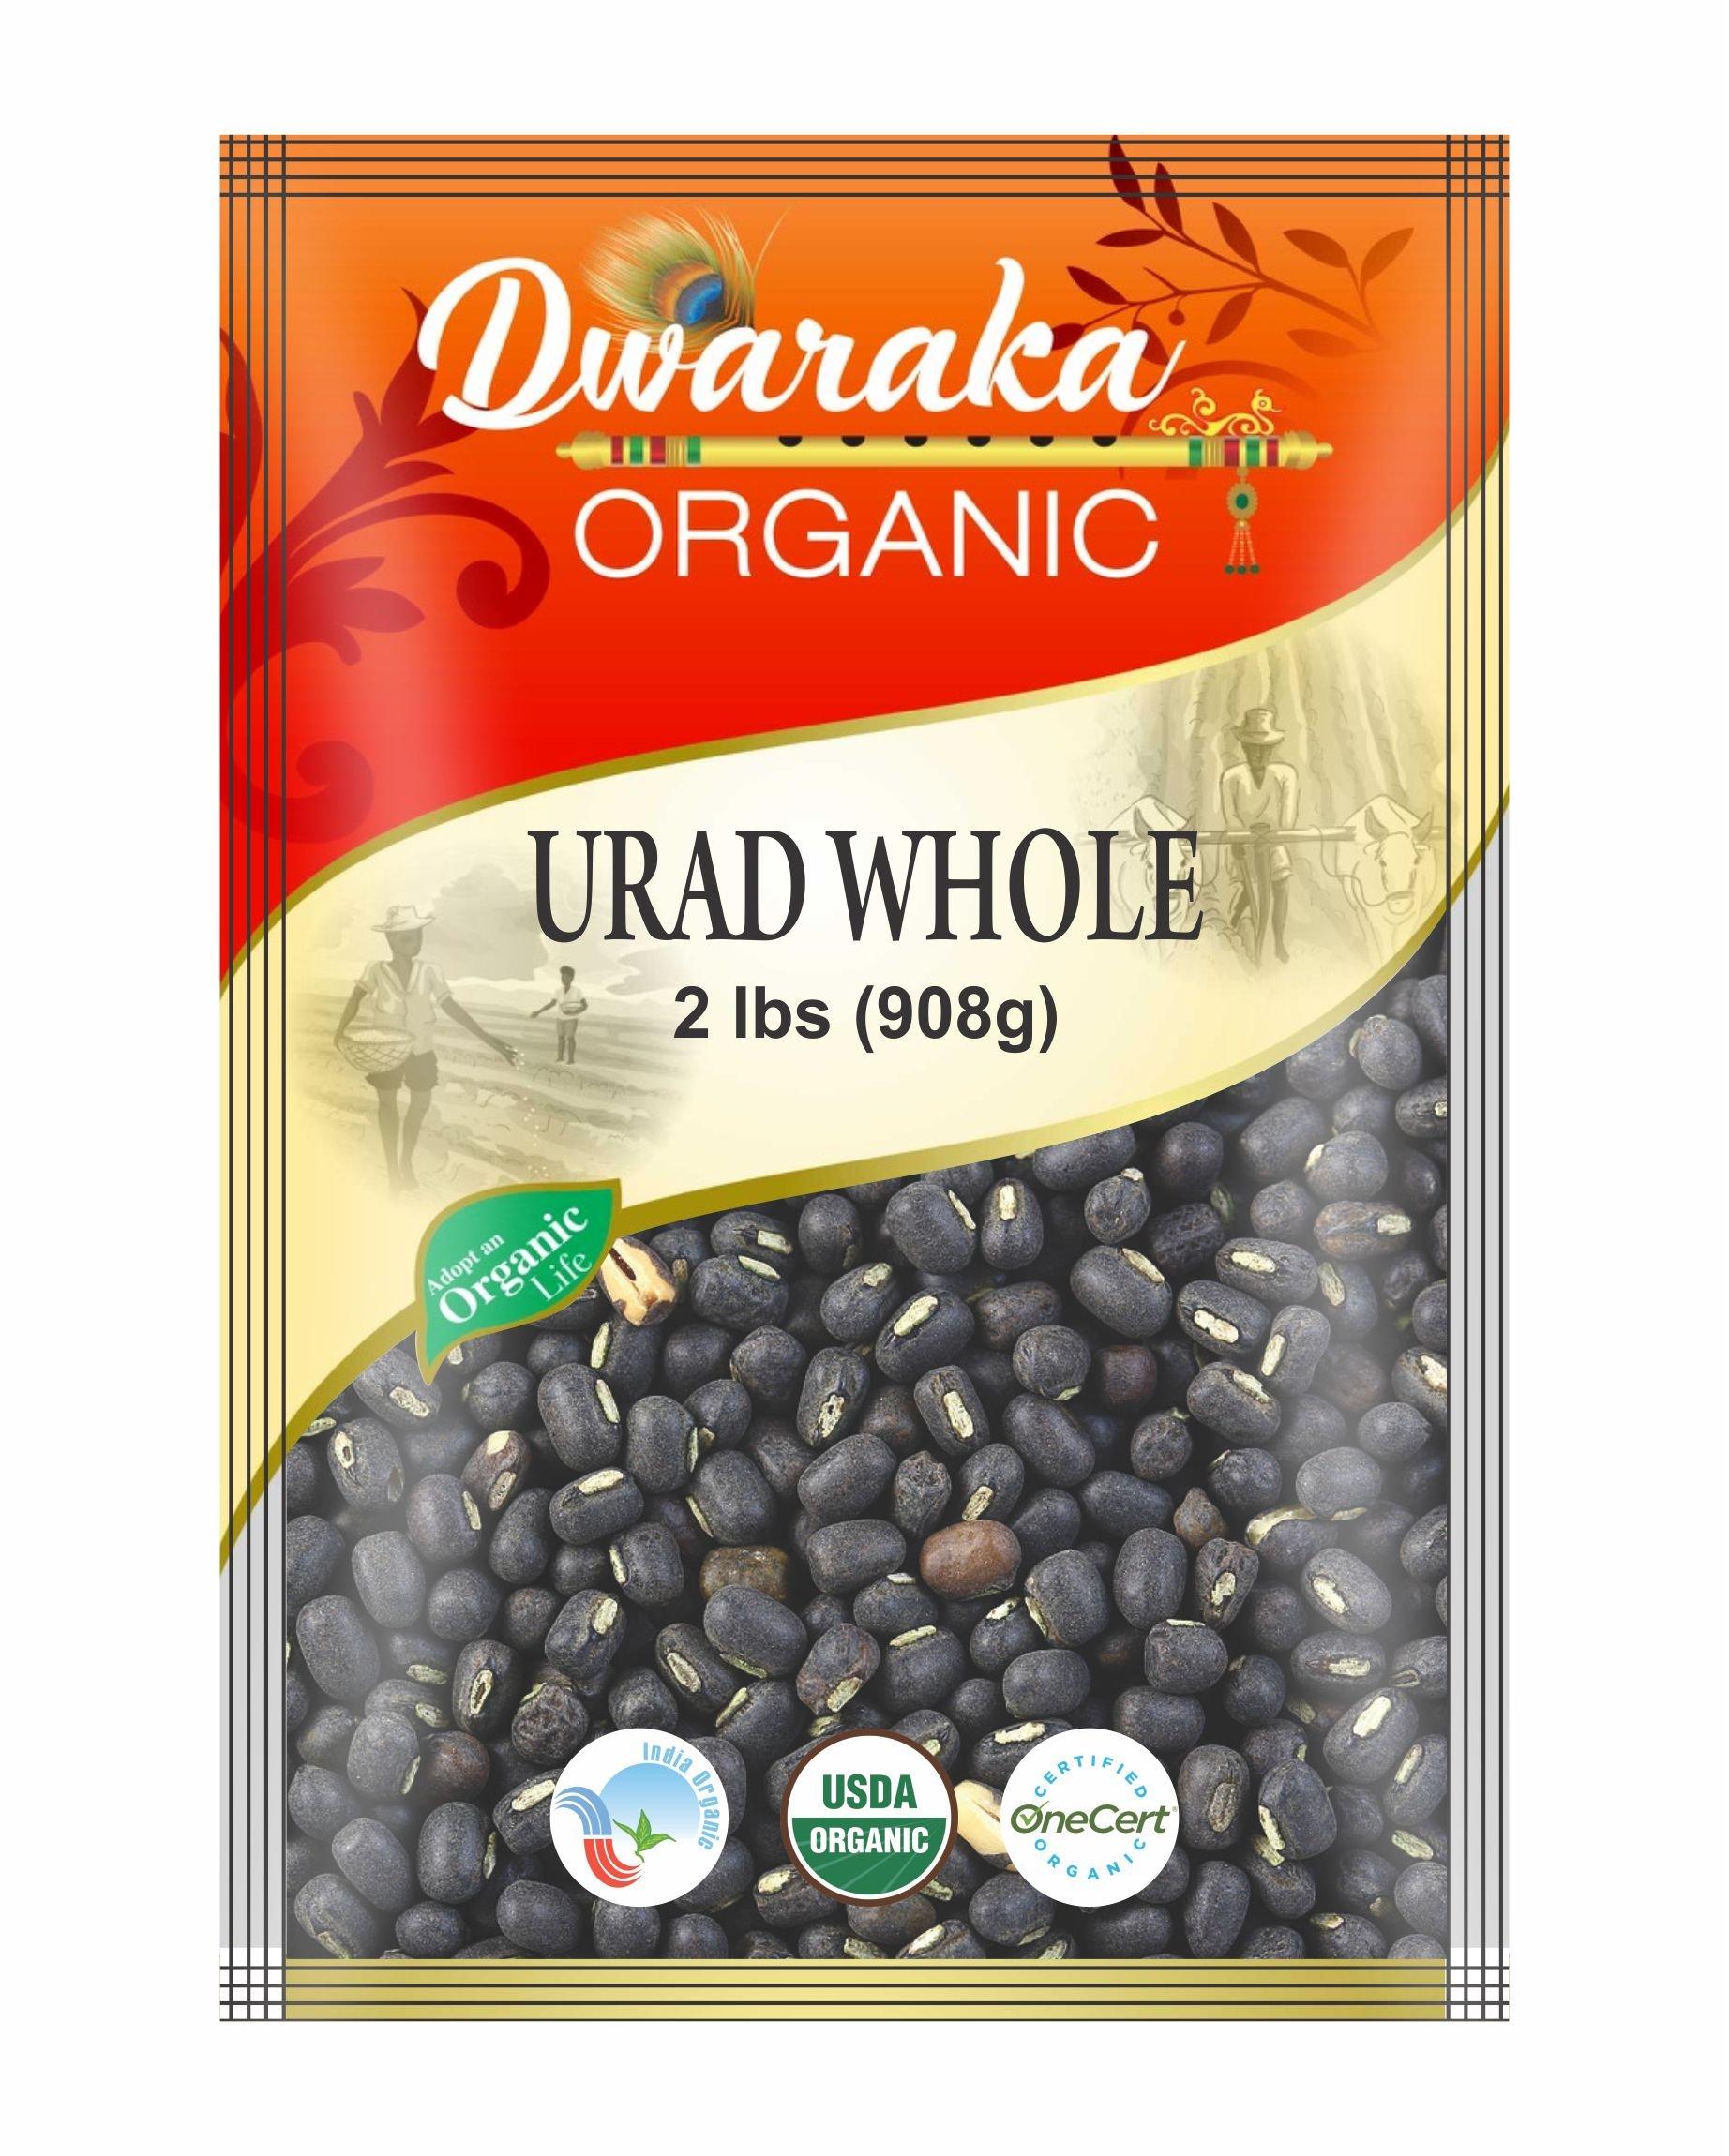 Dwaraka Organic Urad Whole Black Gram Whole Dal Lentil USDA Organic (2 lbs / 908 g)